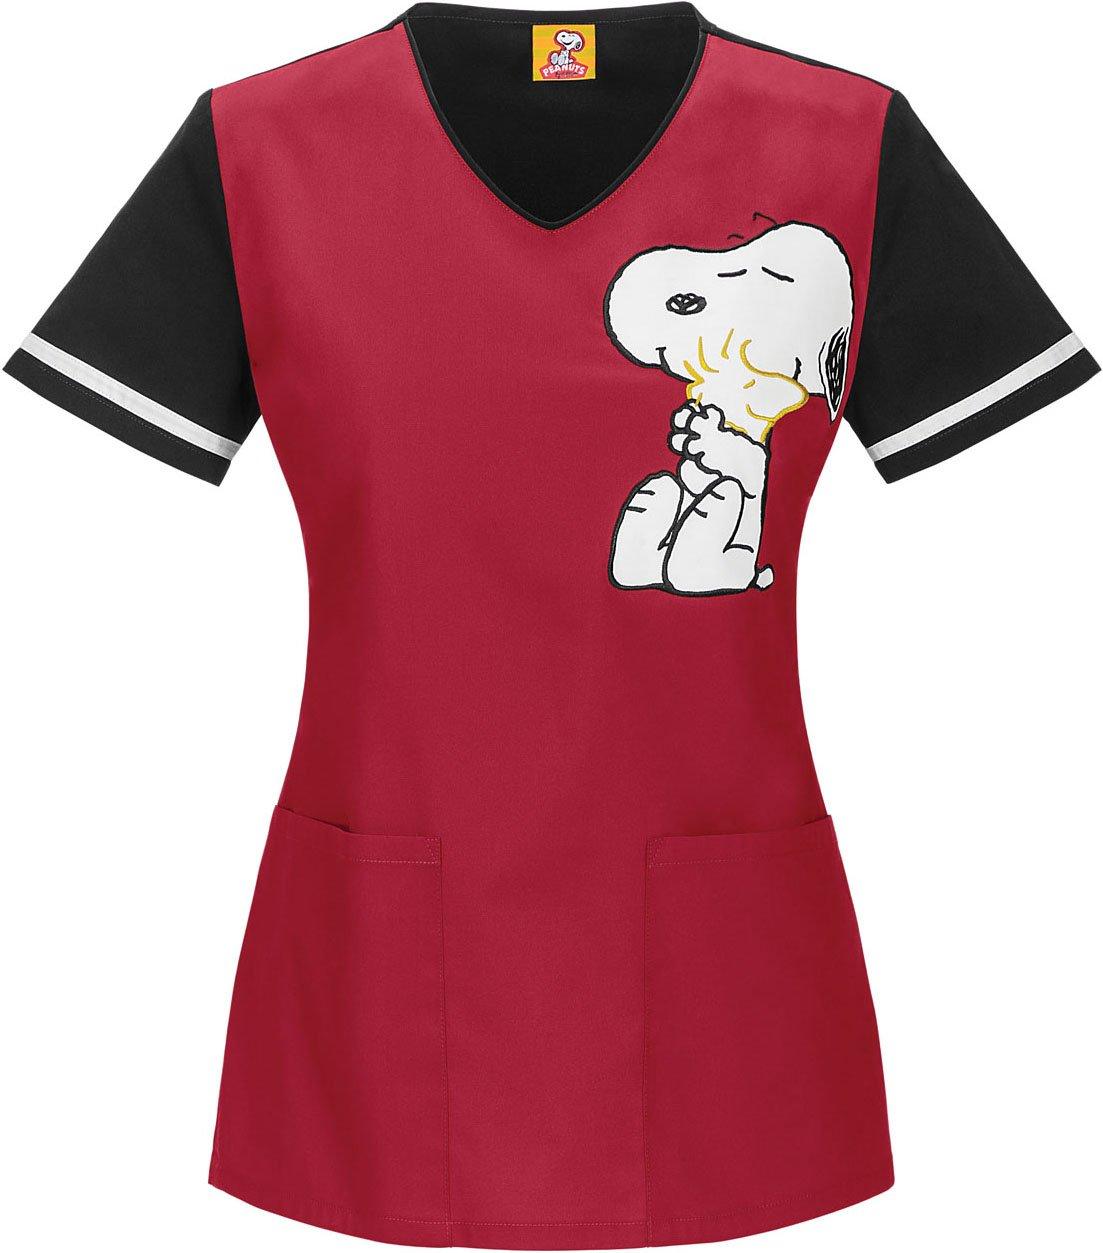 Tooniforms 6792 Women's V-Neck Top Hug Me Snoopy Black Medium